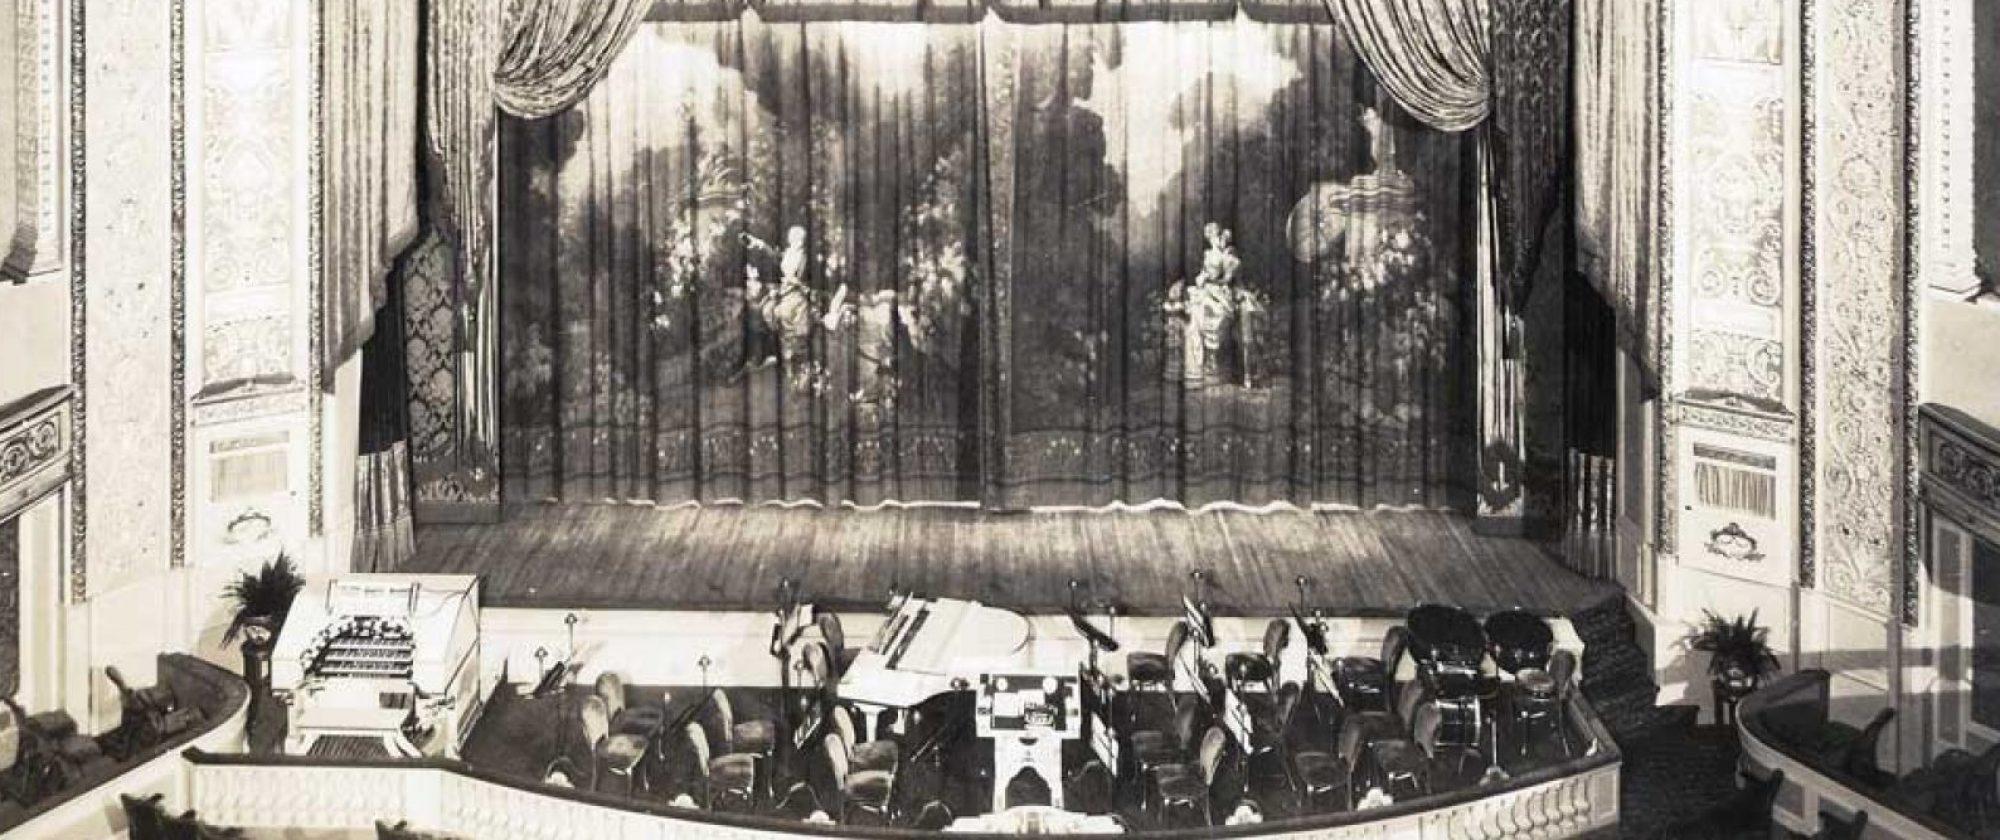 Vaudeville America